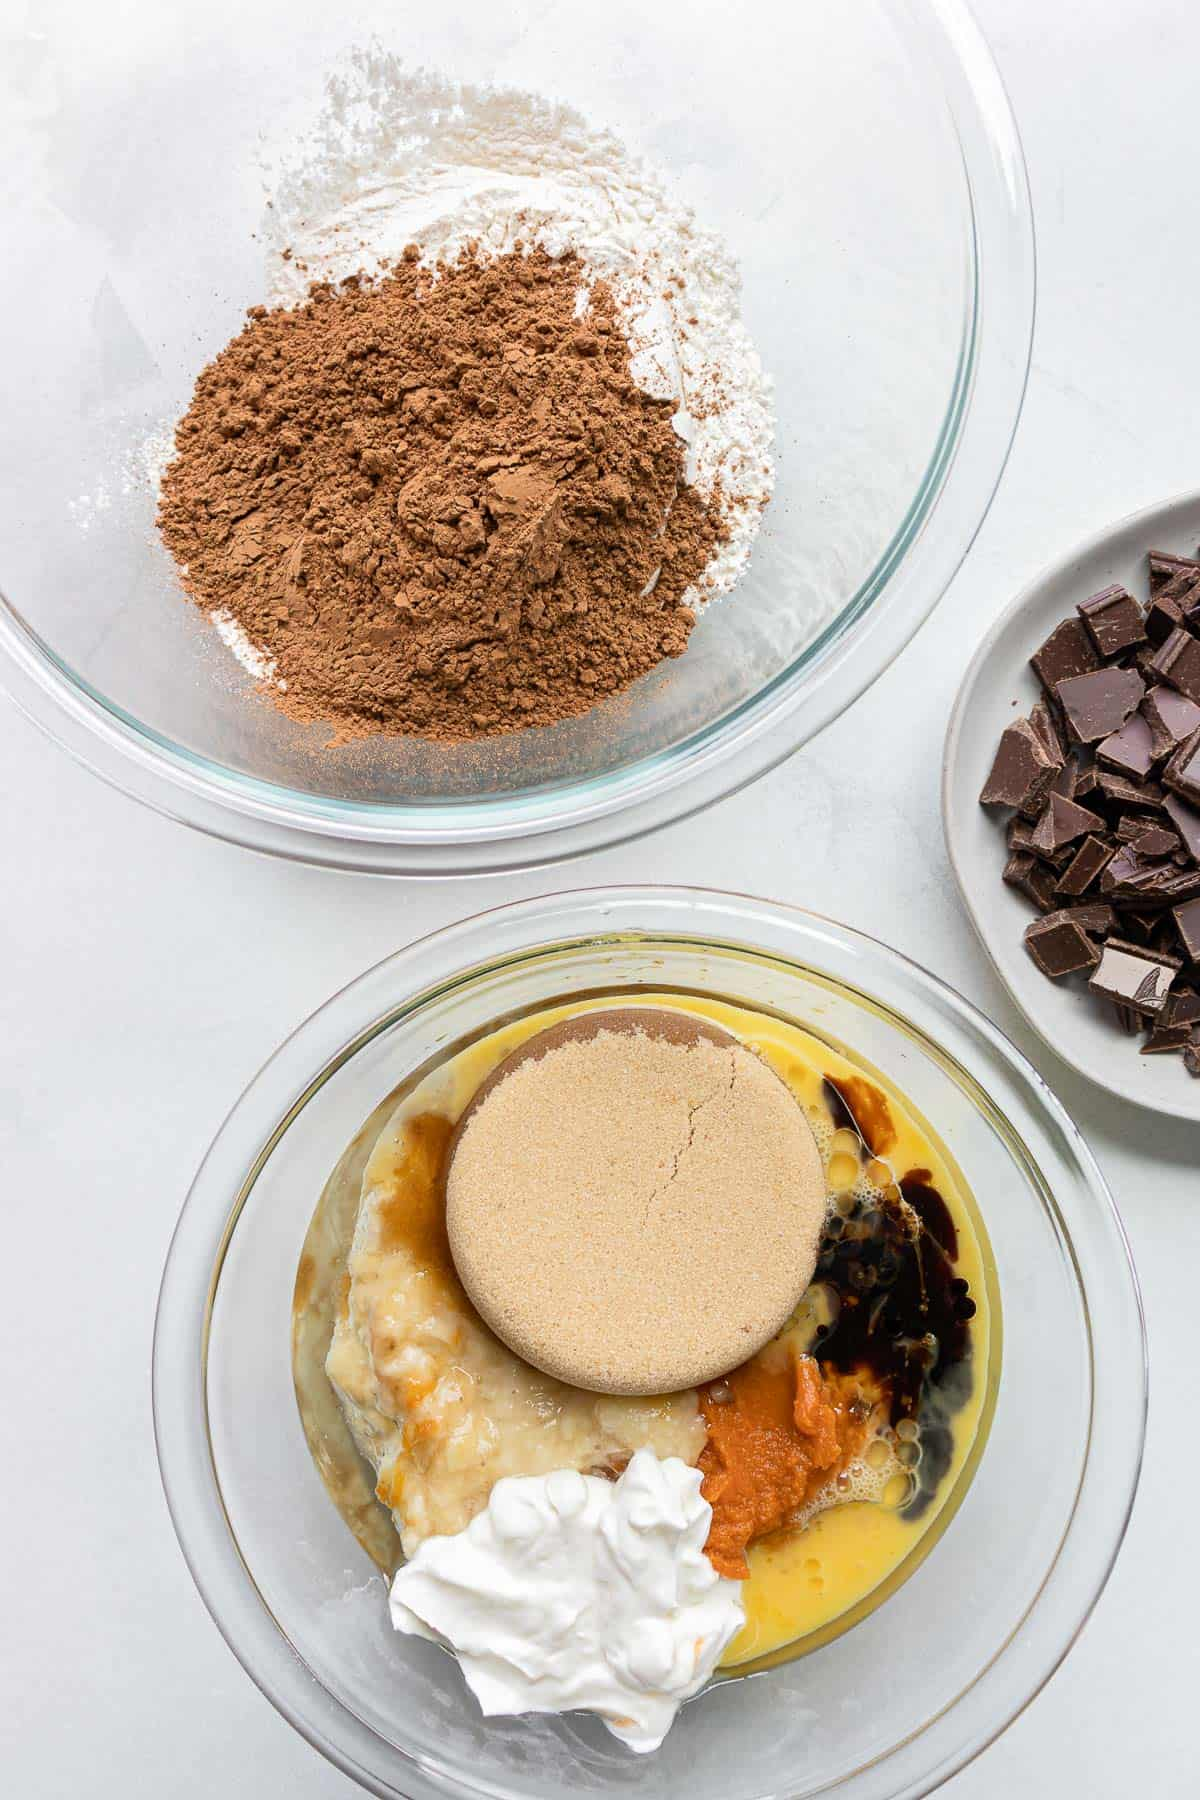 Ingredients for chocolate banana bread - flour, sugar, banana, eggs, chocolate, baking soda, salt